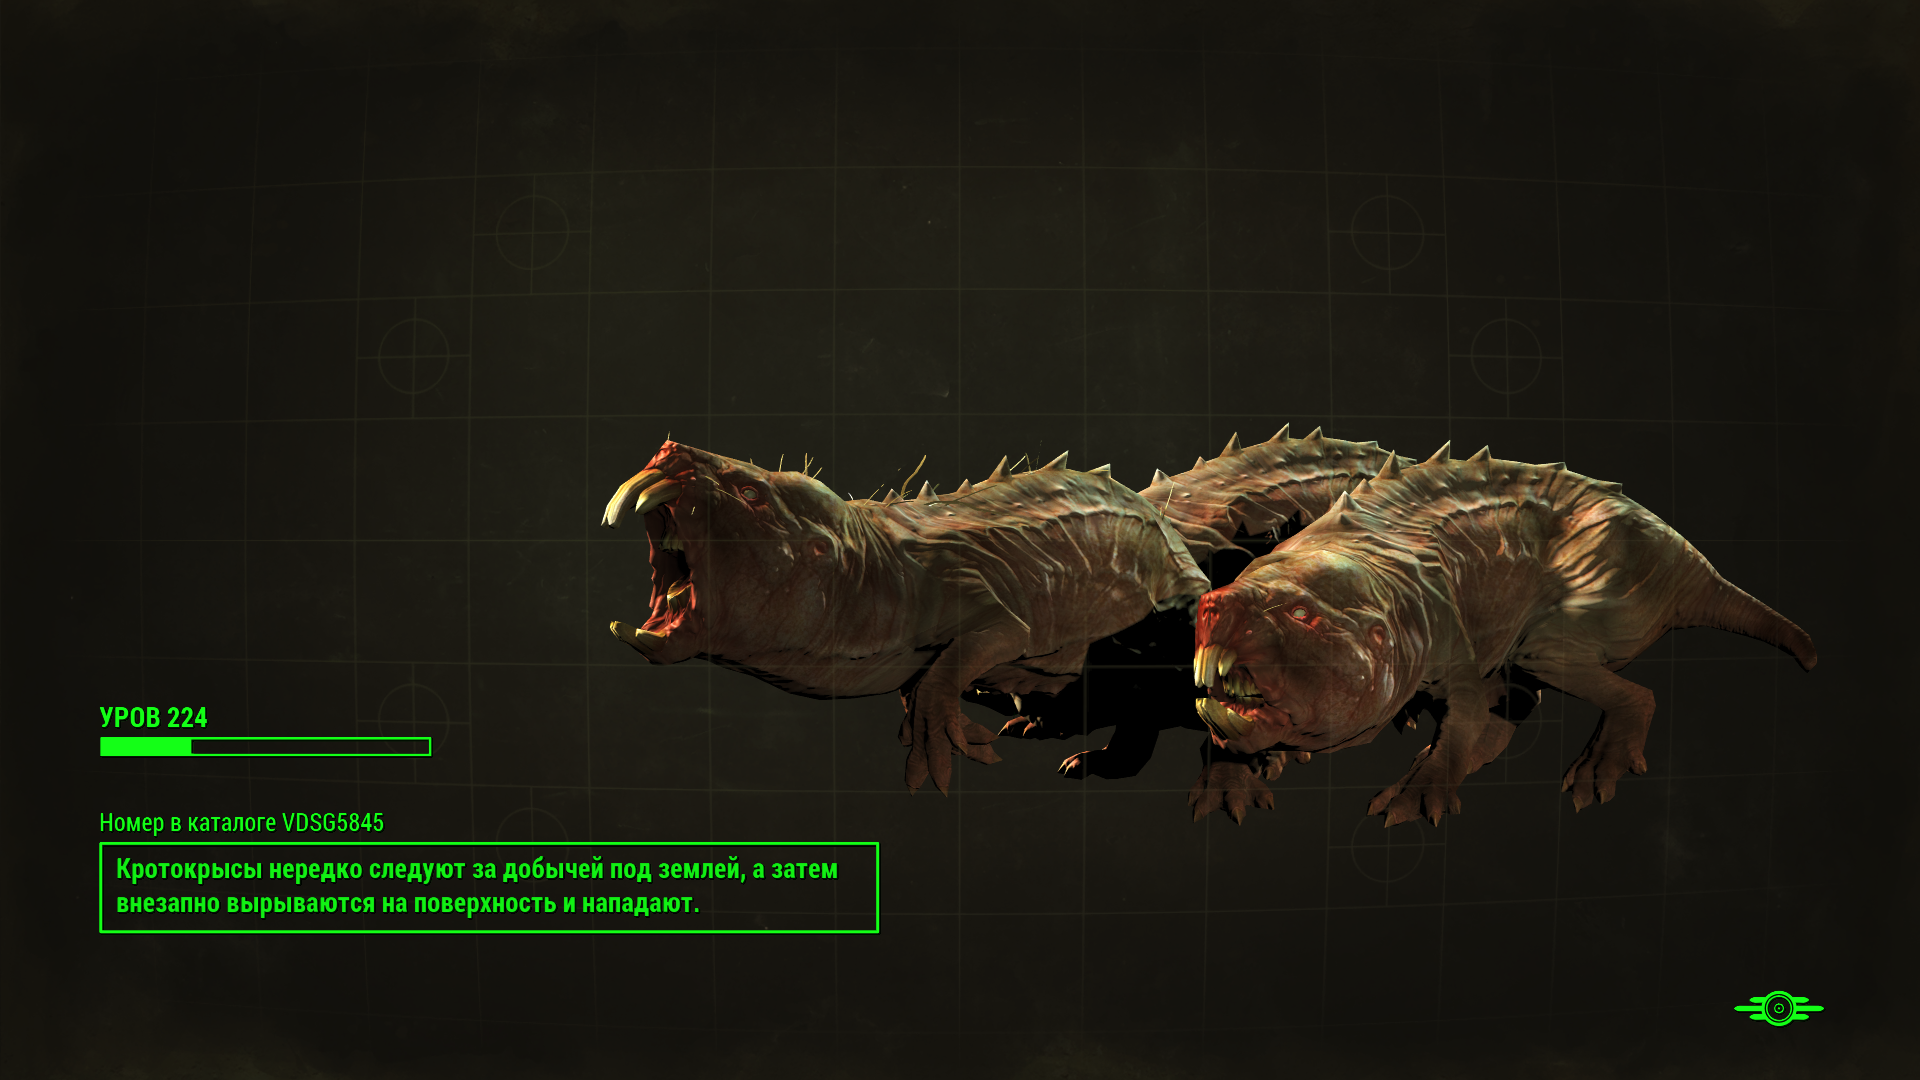 Кротокрыс (Fallout 4)